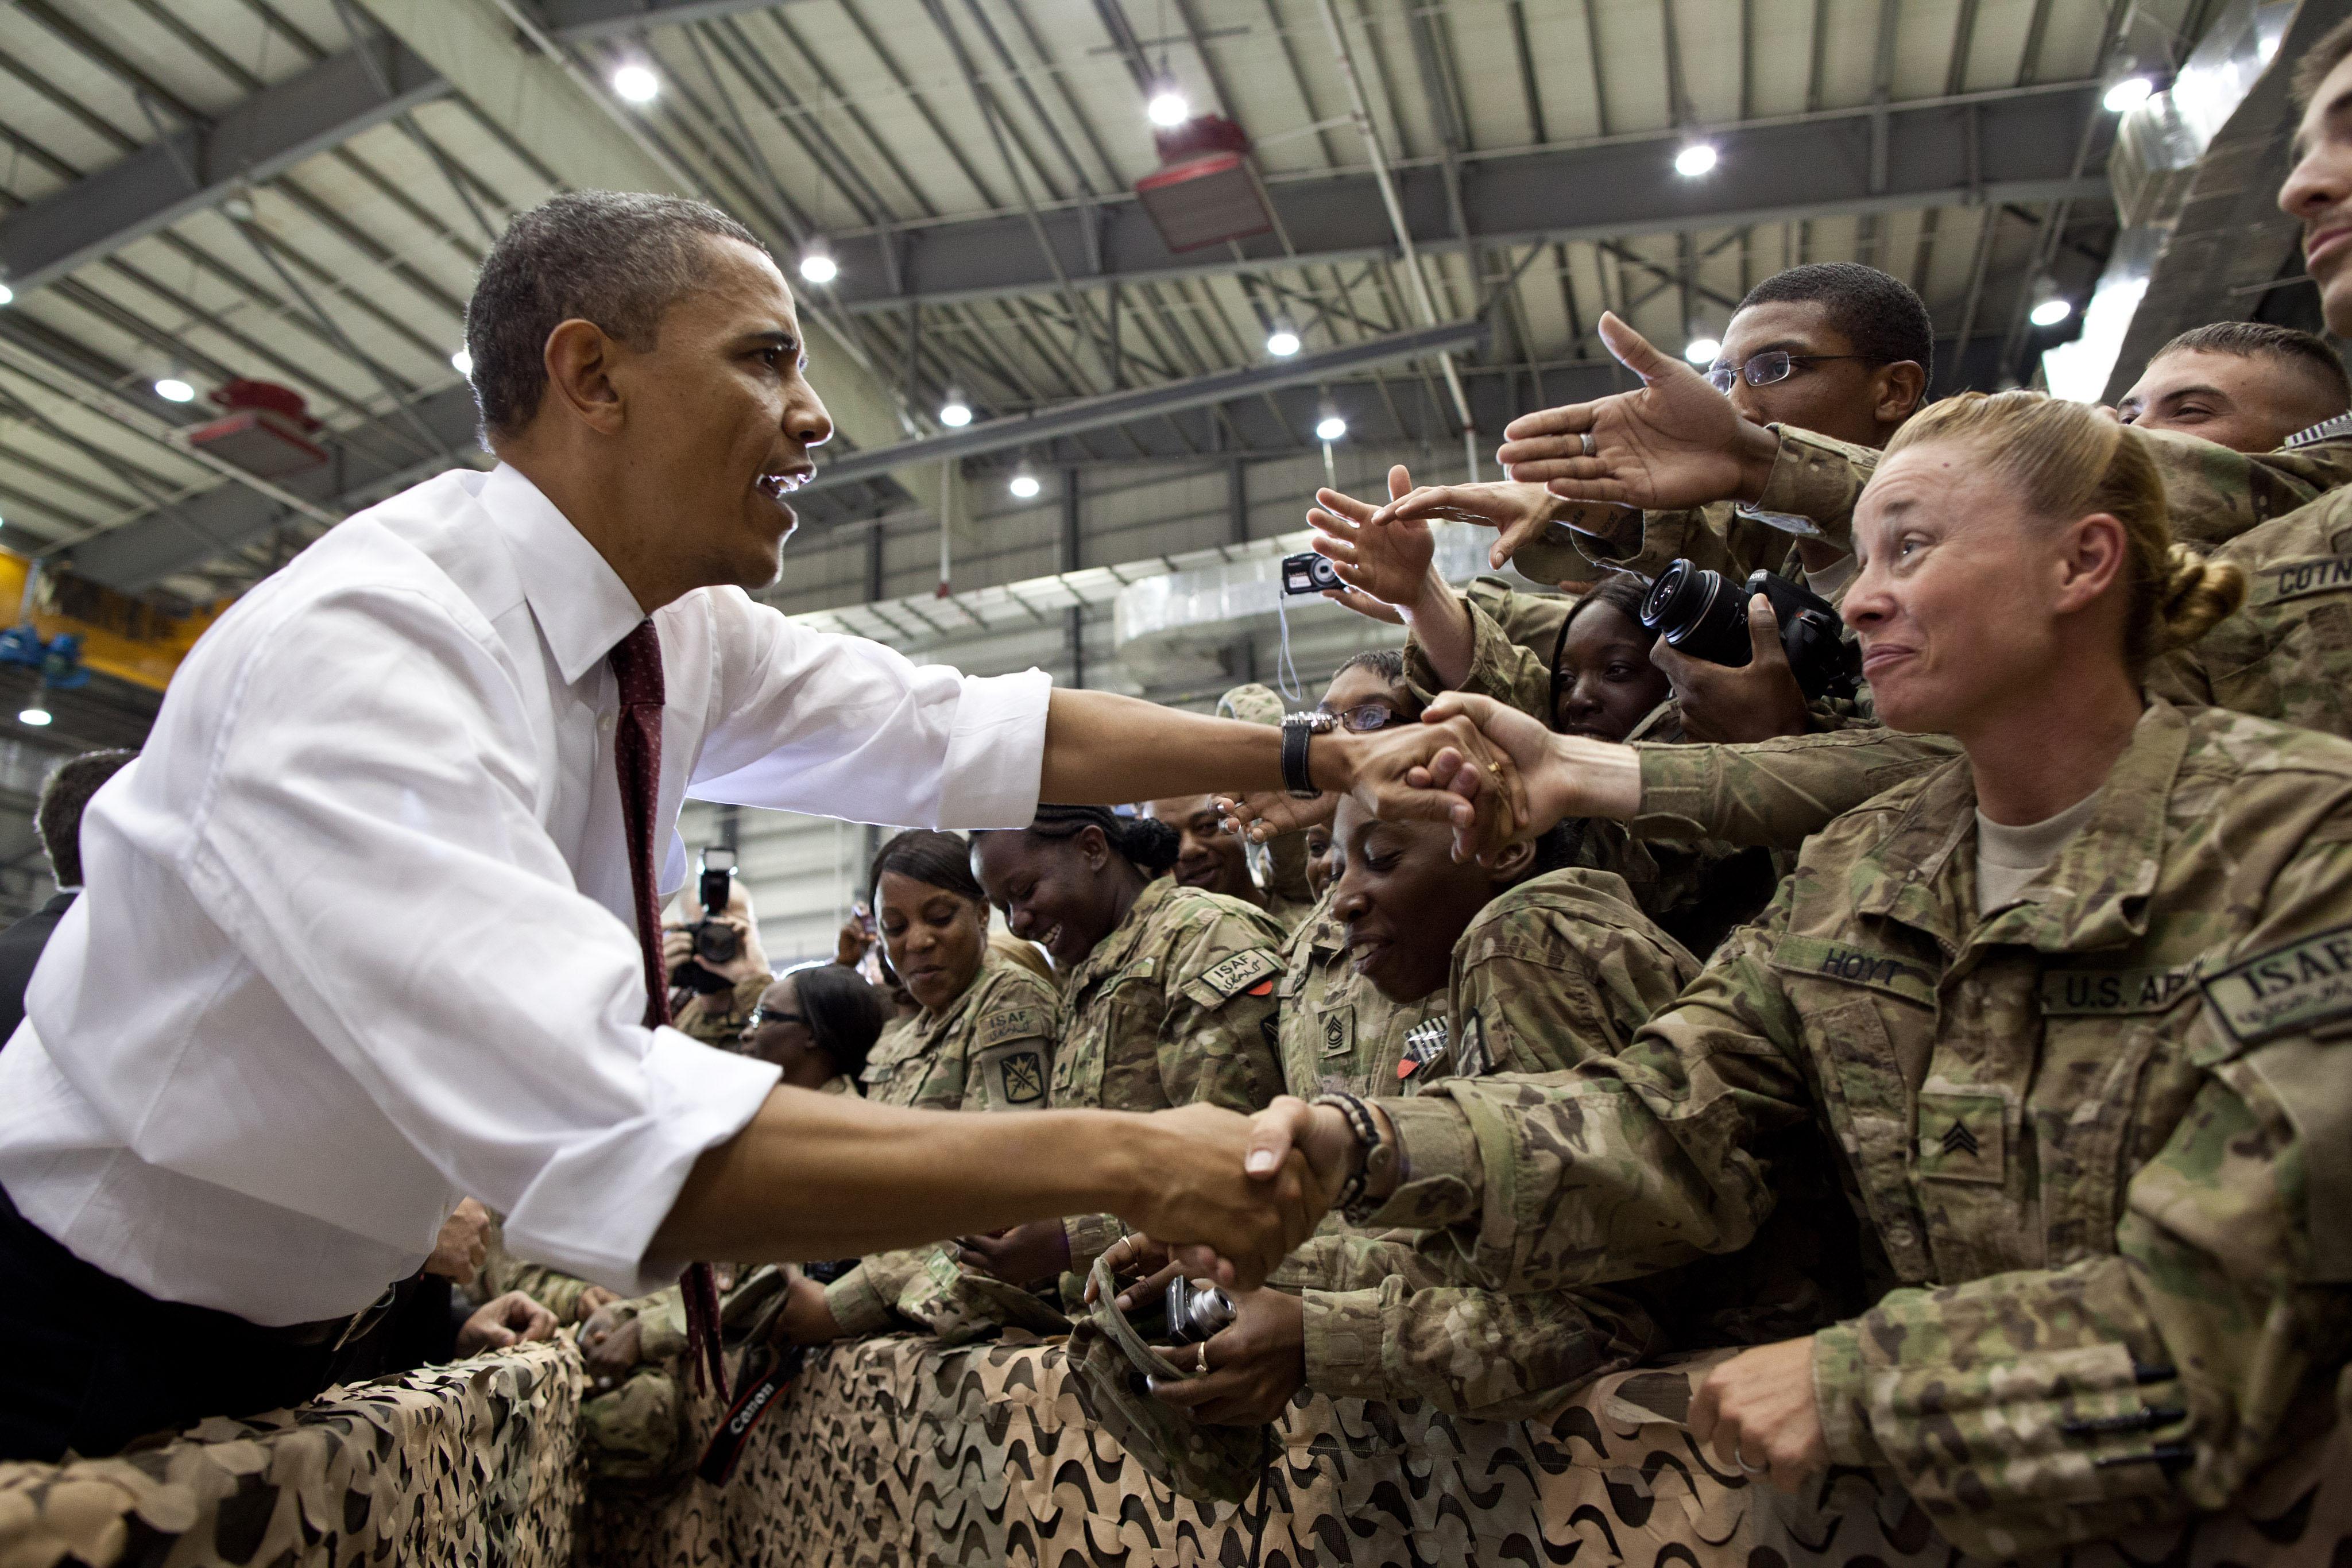 American soldiers visit afgan whorehouse - 1 1